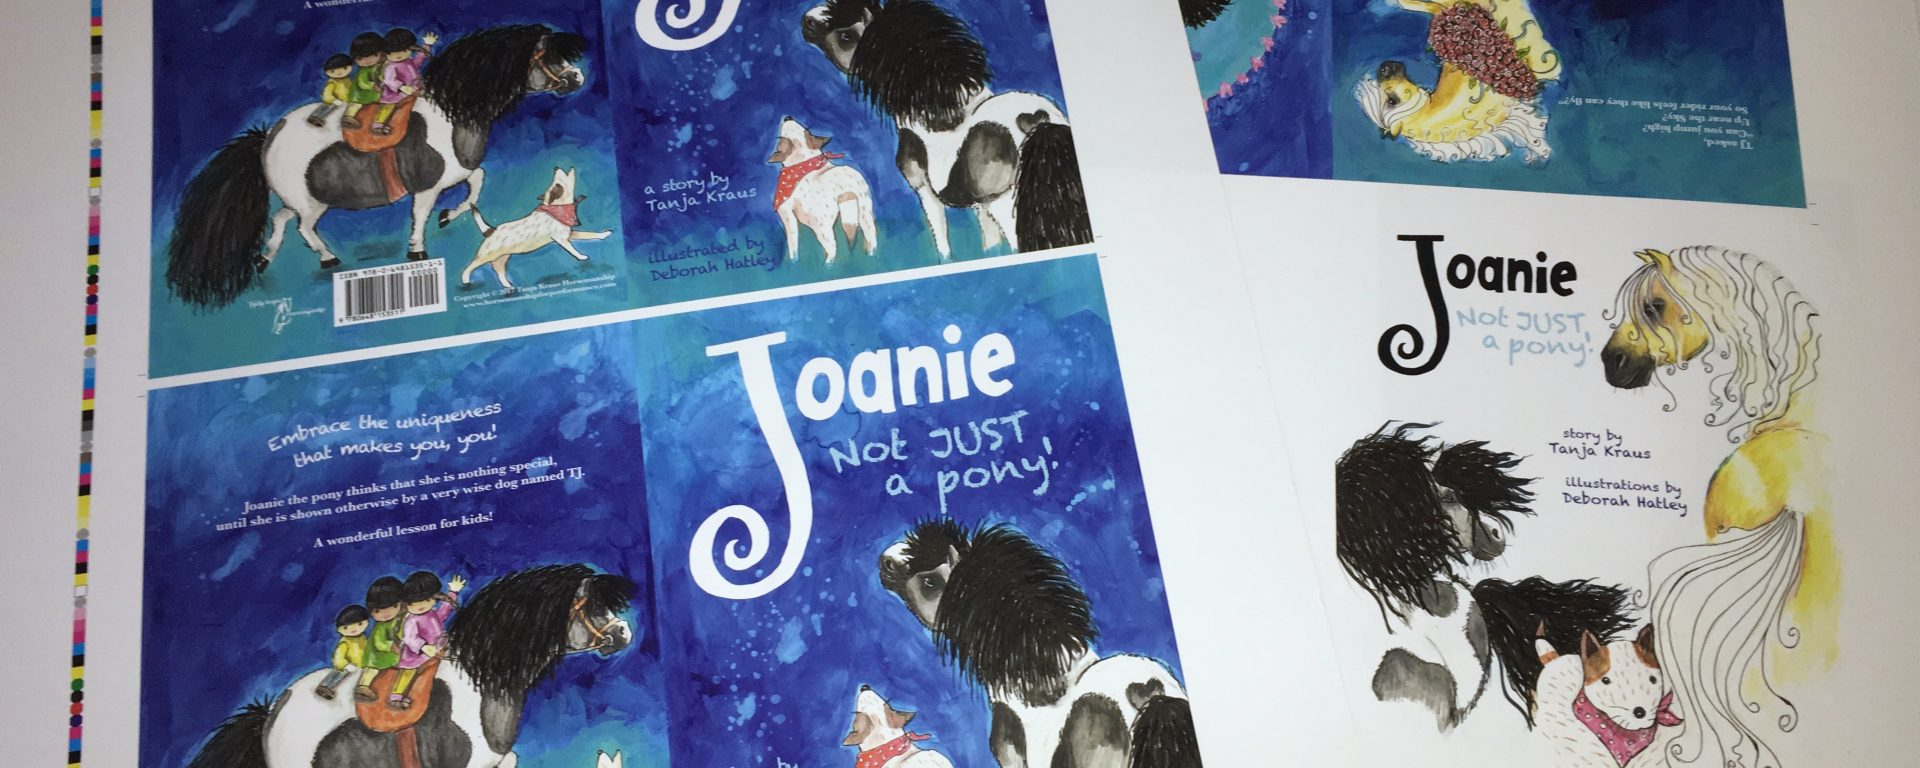 Joanie childrens book proof